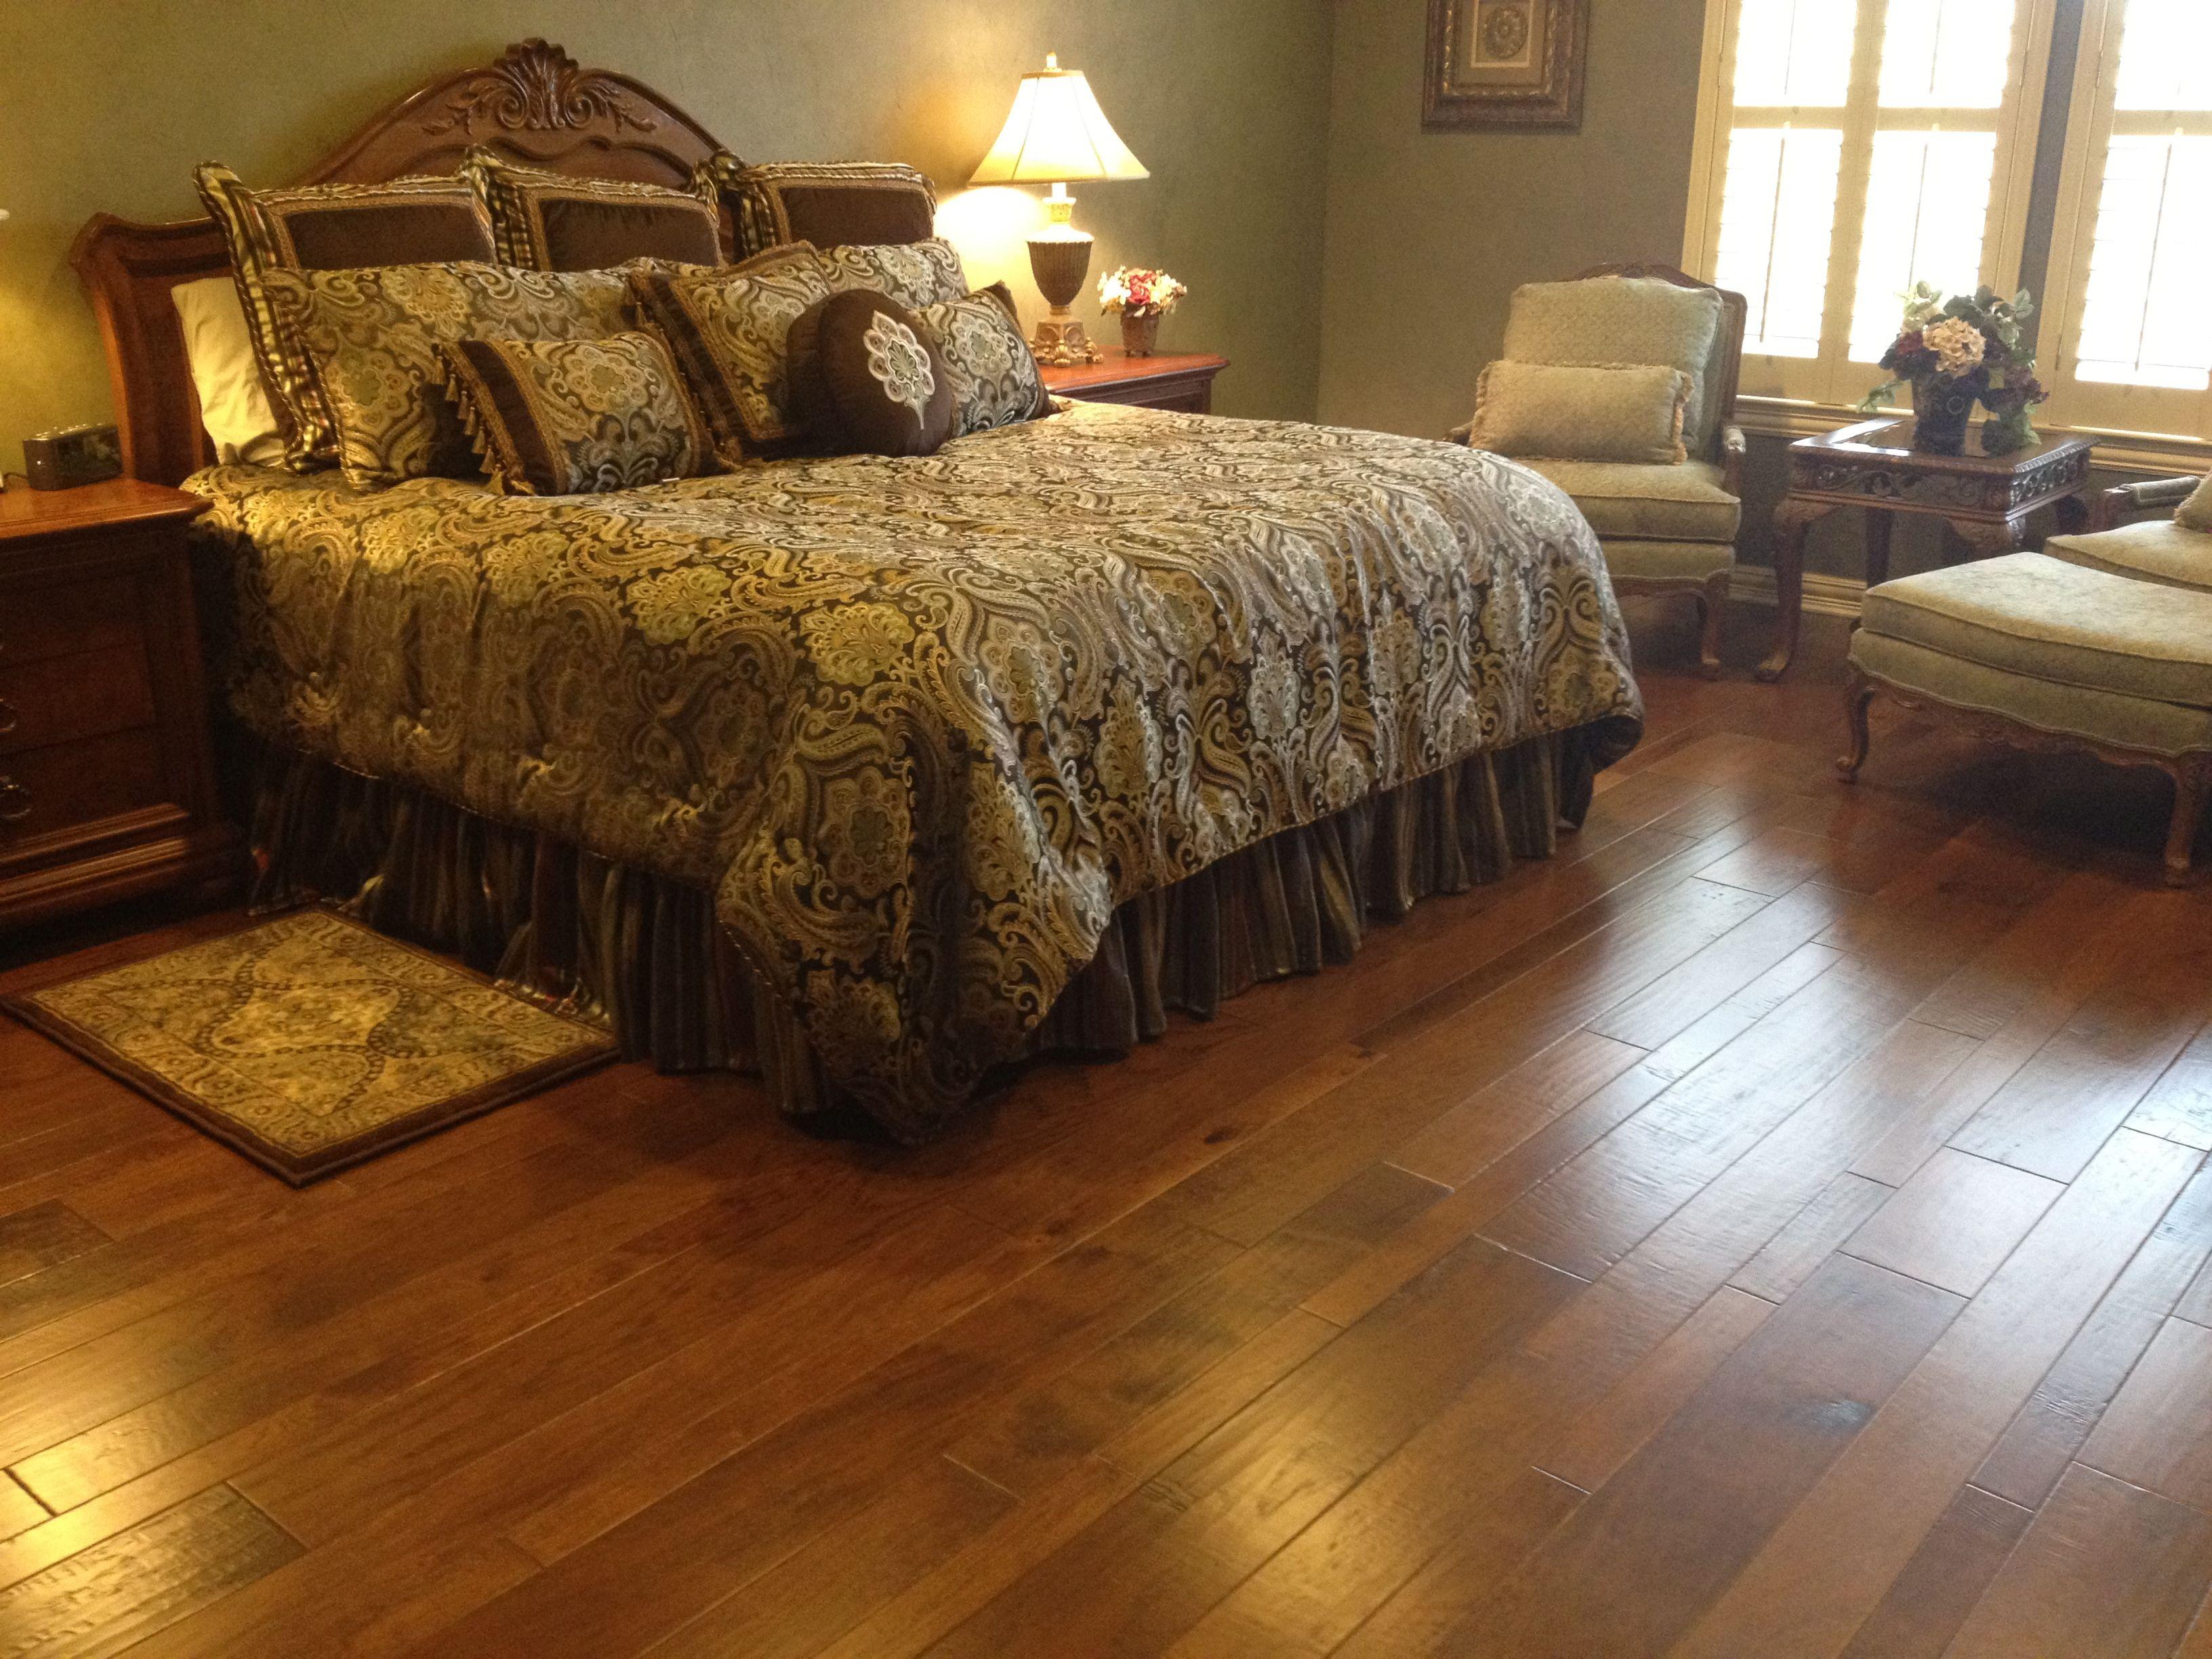 hardwood floorzz menars engineered flooring products floors moulin bella collection collections lifestyle chambord cera